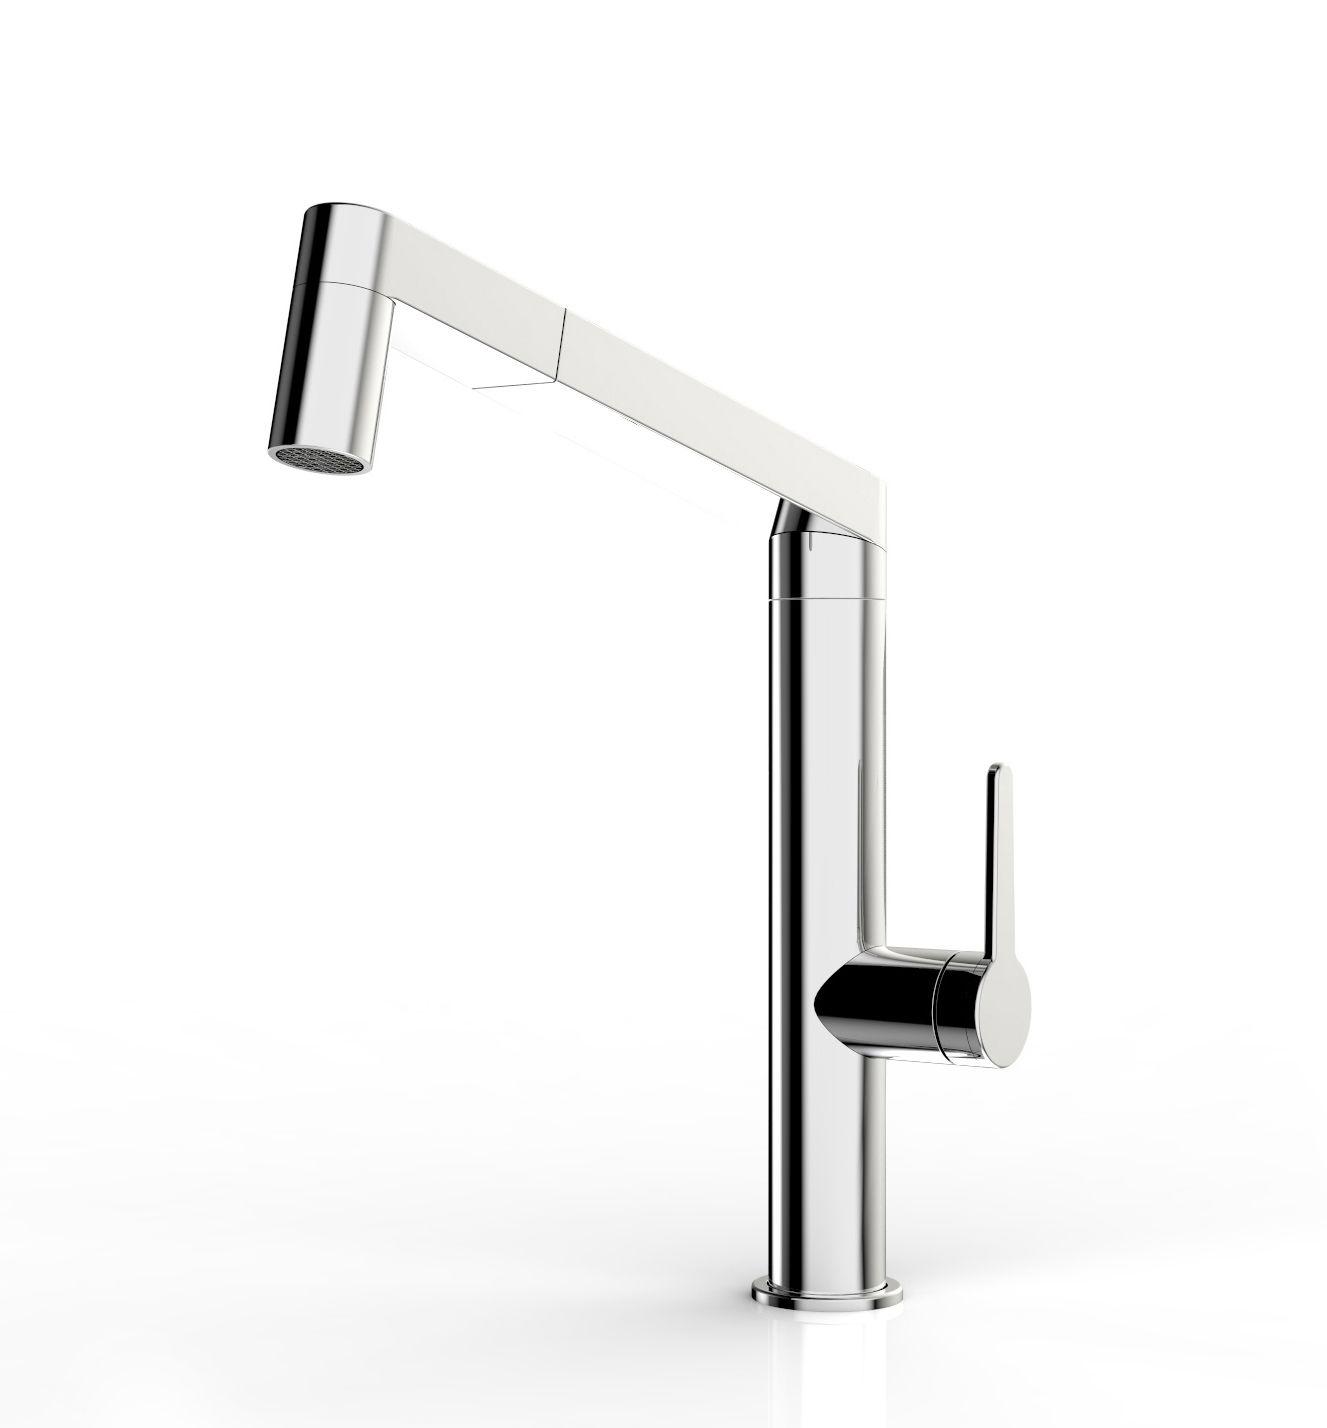 Stainless Steel Kitchen Faucet Part - 37: Panera-S _ Stainless Steel Kitchen Faucet For Blanco Steel Art